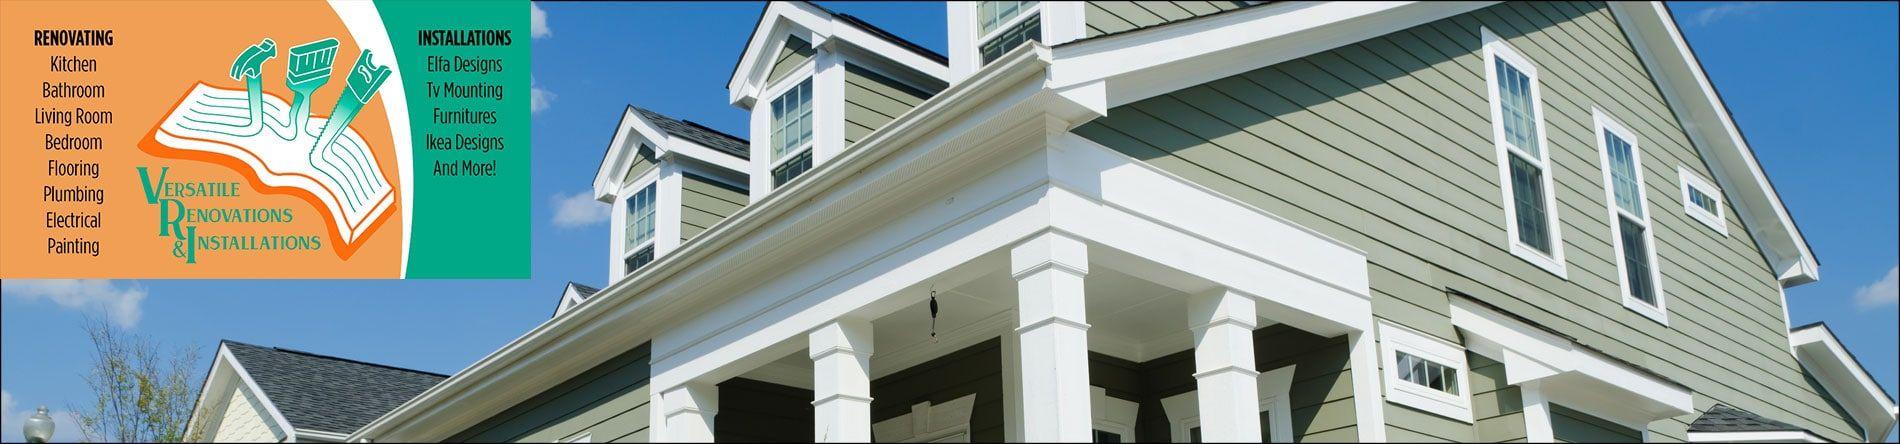 Versatile Renovations And Installations Llc Renovations Installation Remodeling Service